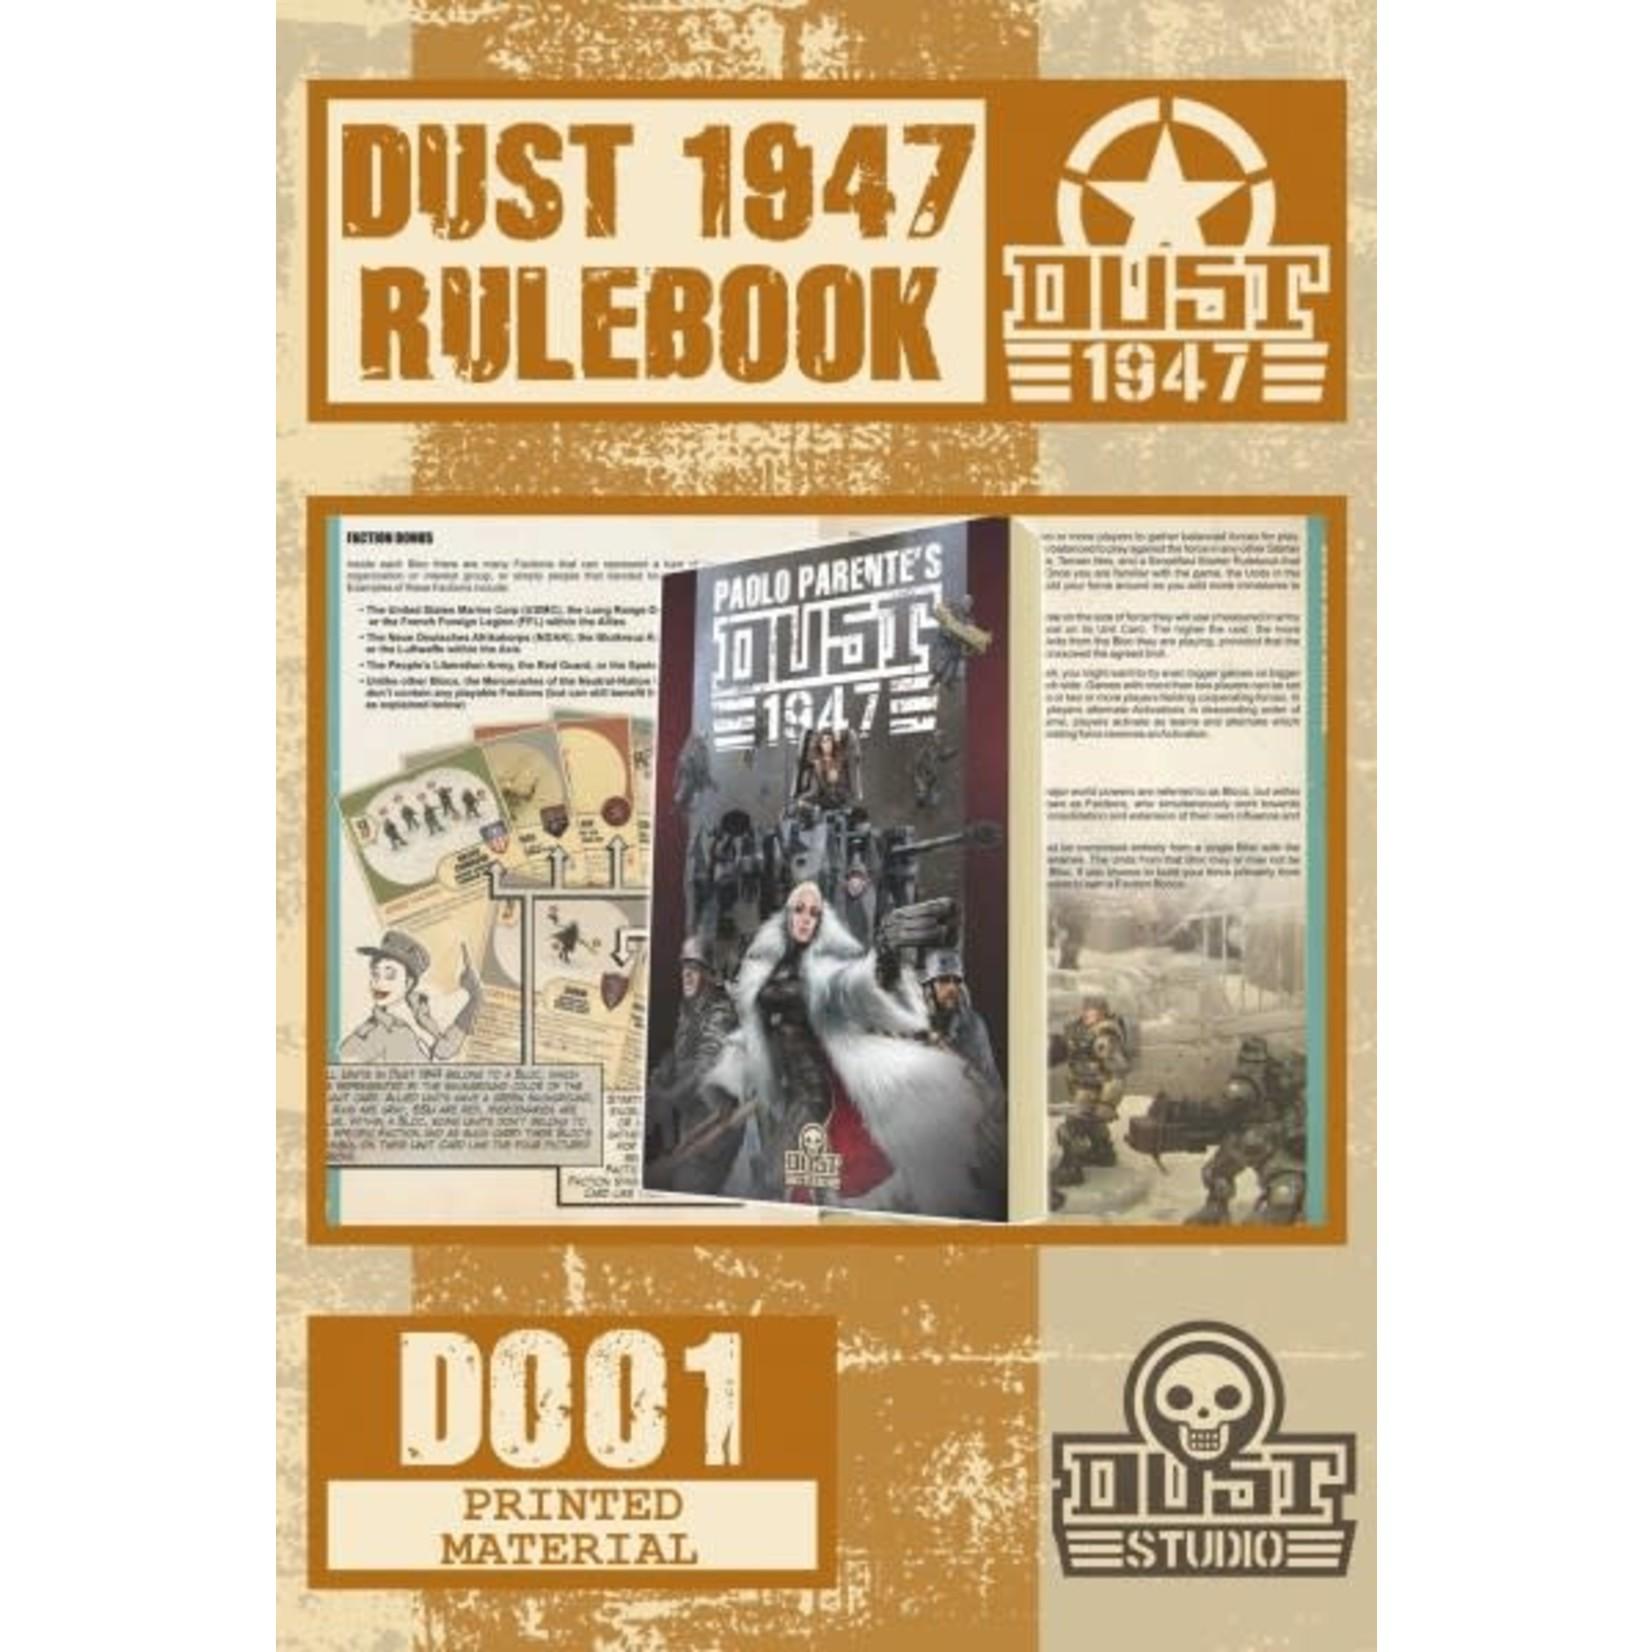 Dust Dust 1947 Rulebook